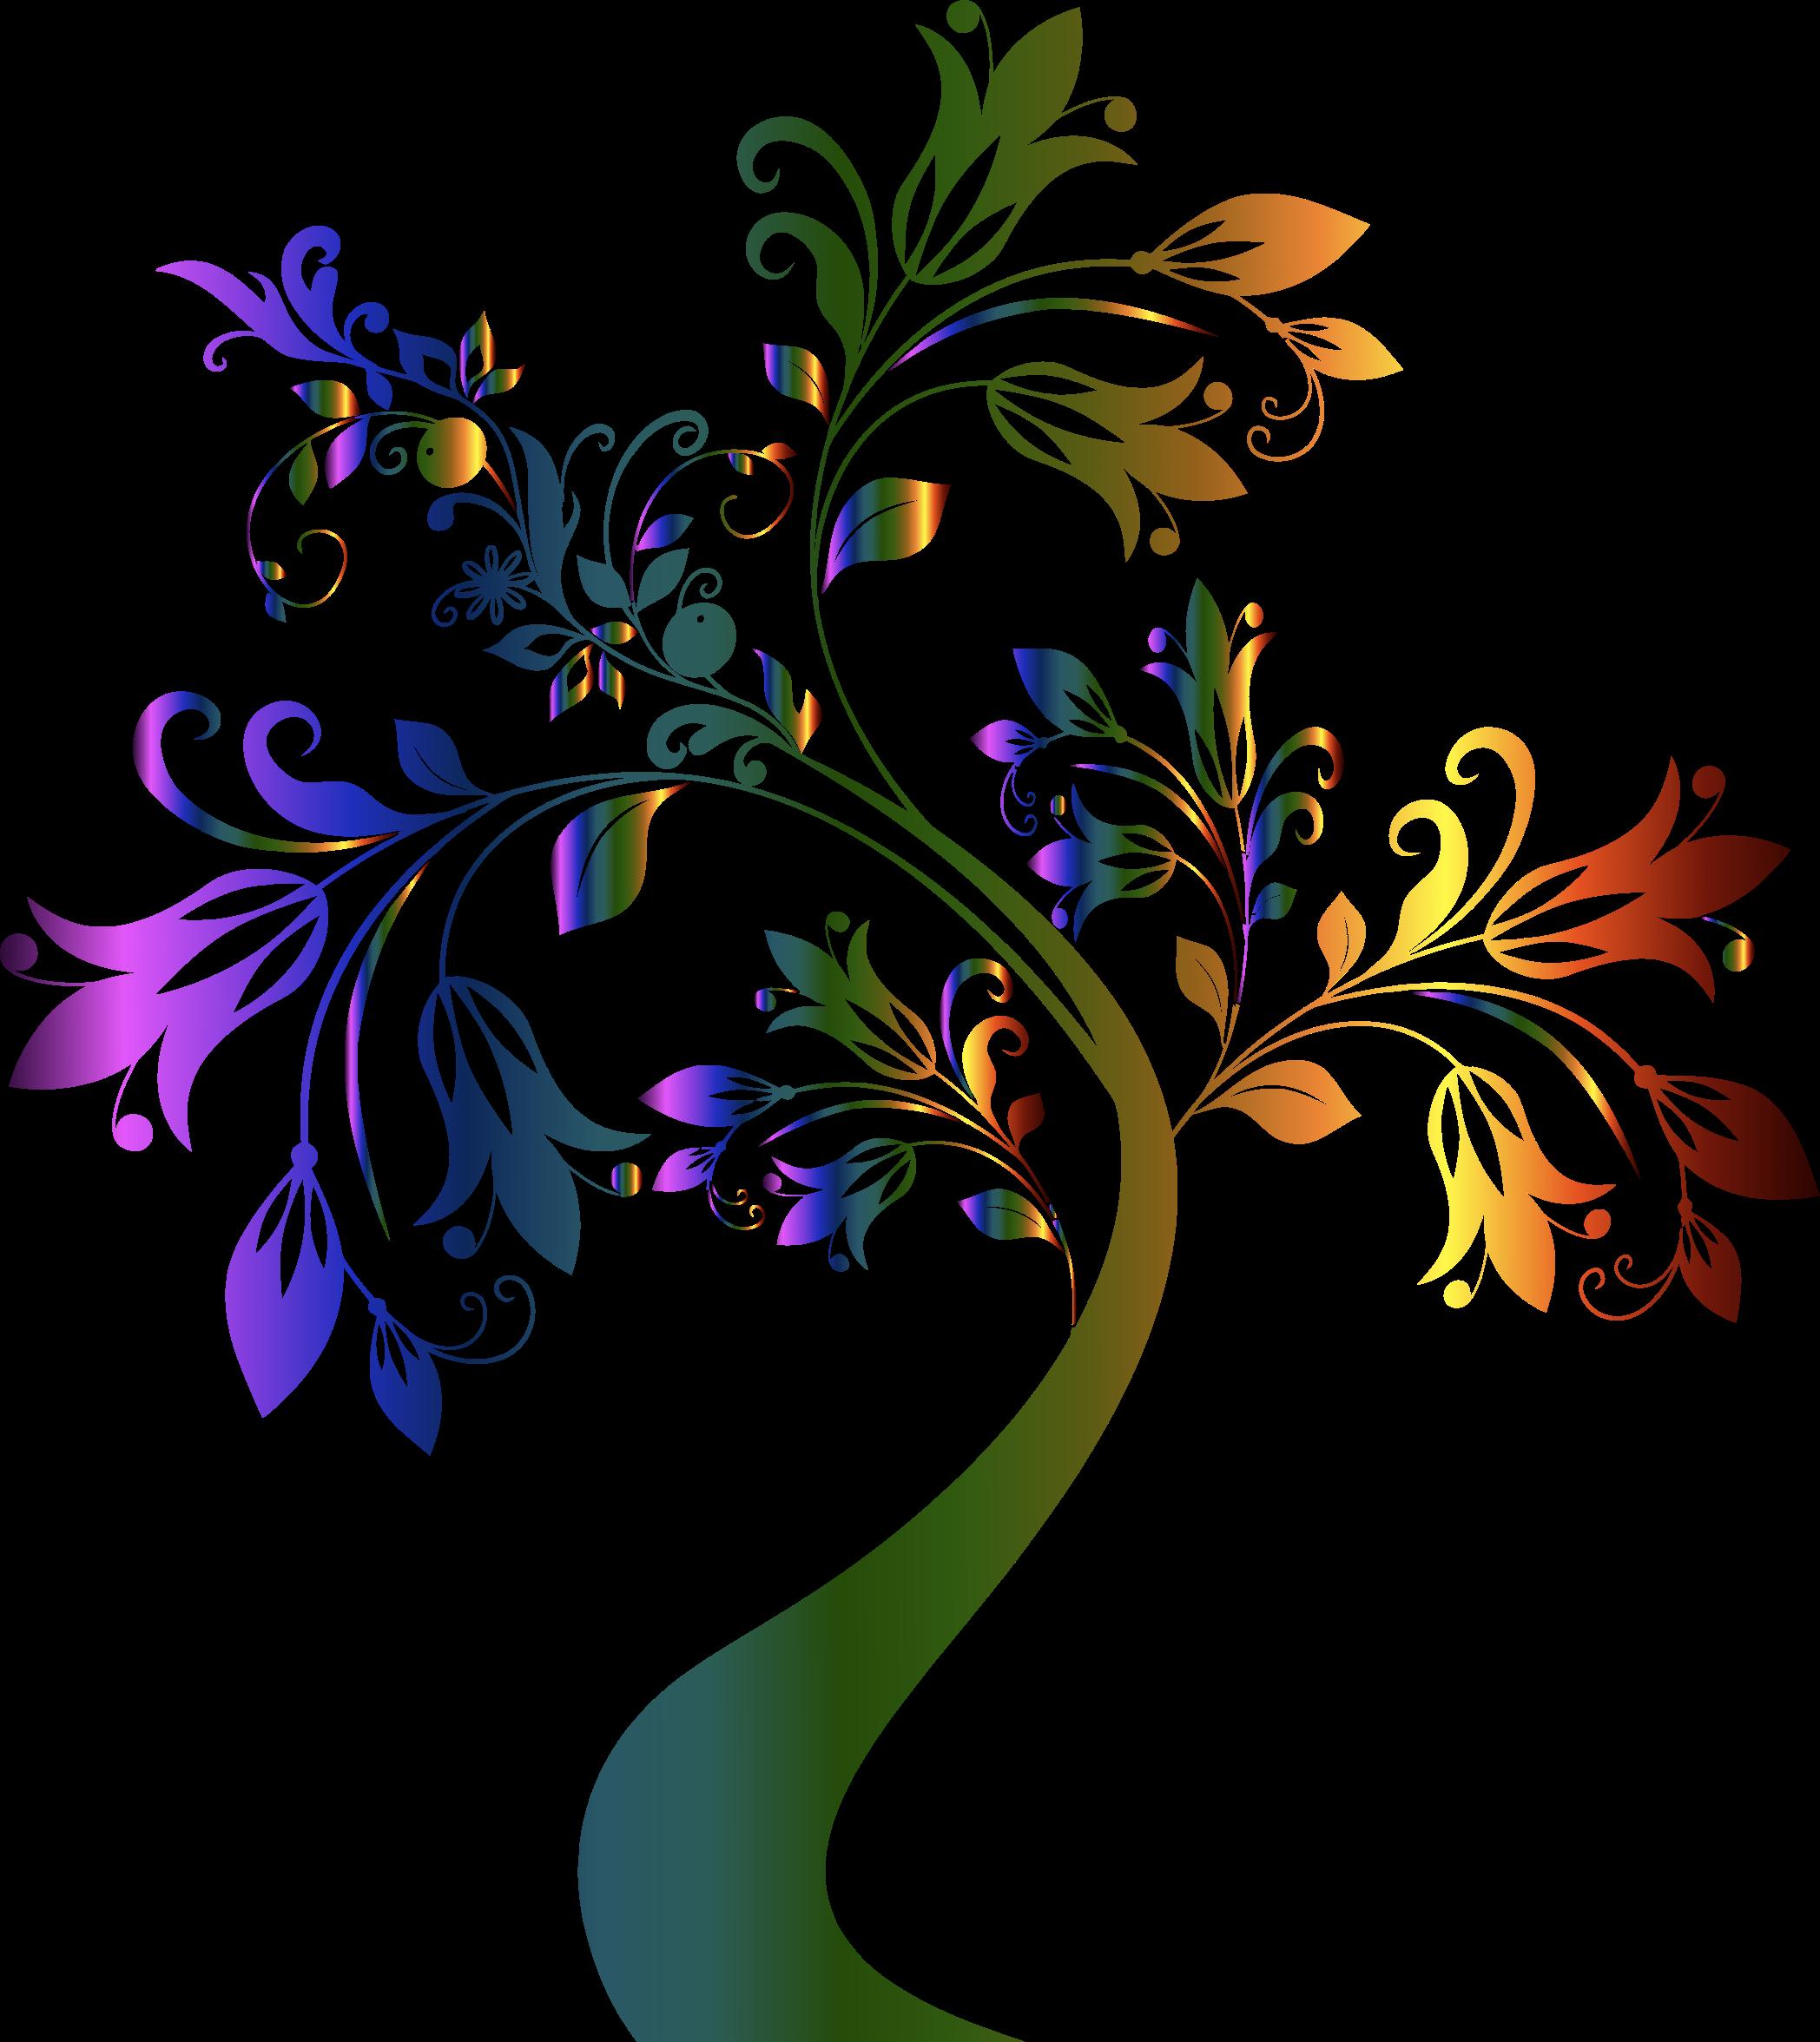 Rainbow tree clipart image free library Clipart - Colorful Floral Tree image free library